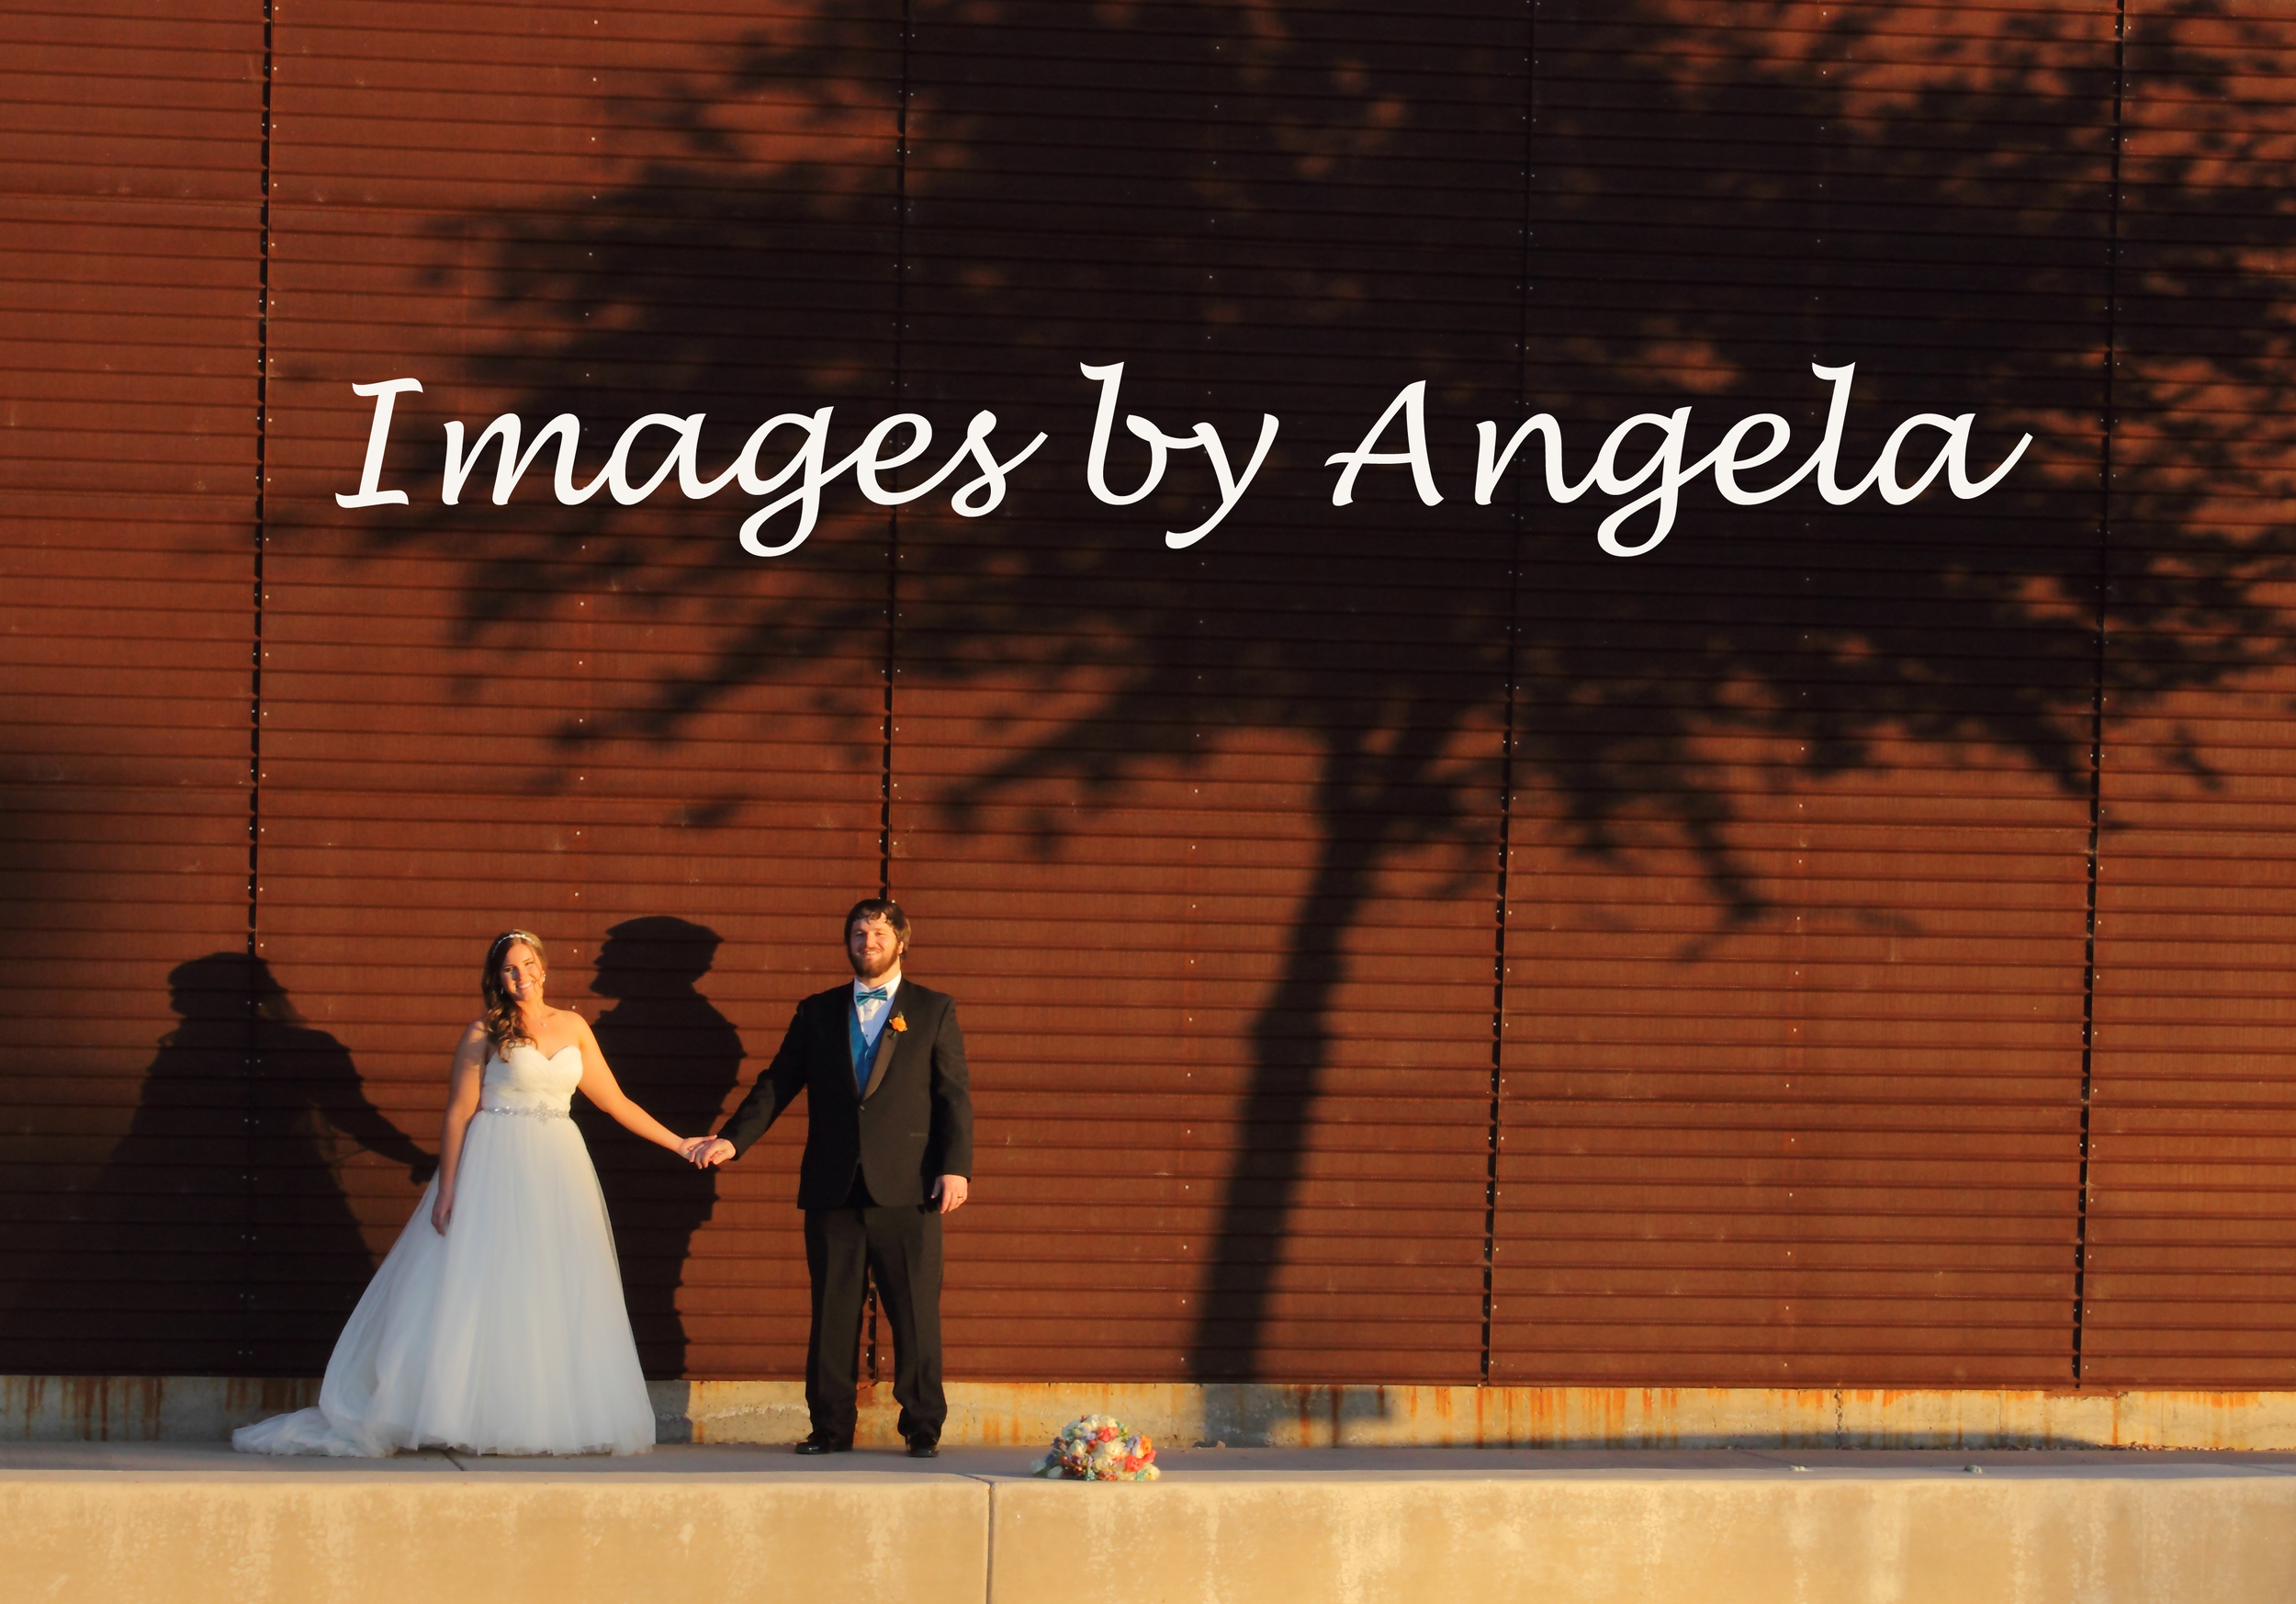 Images by Angela Logo.jpg